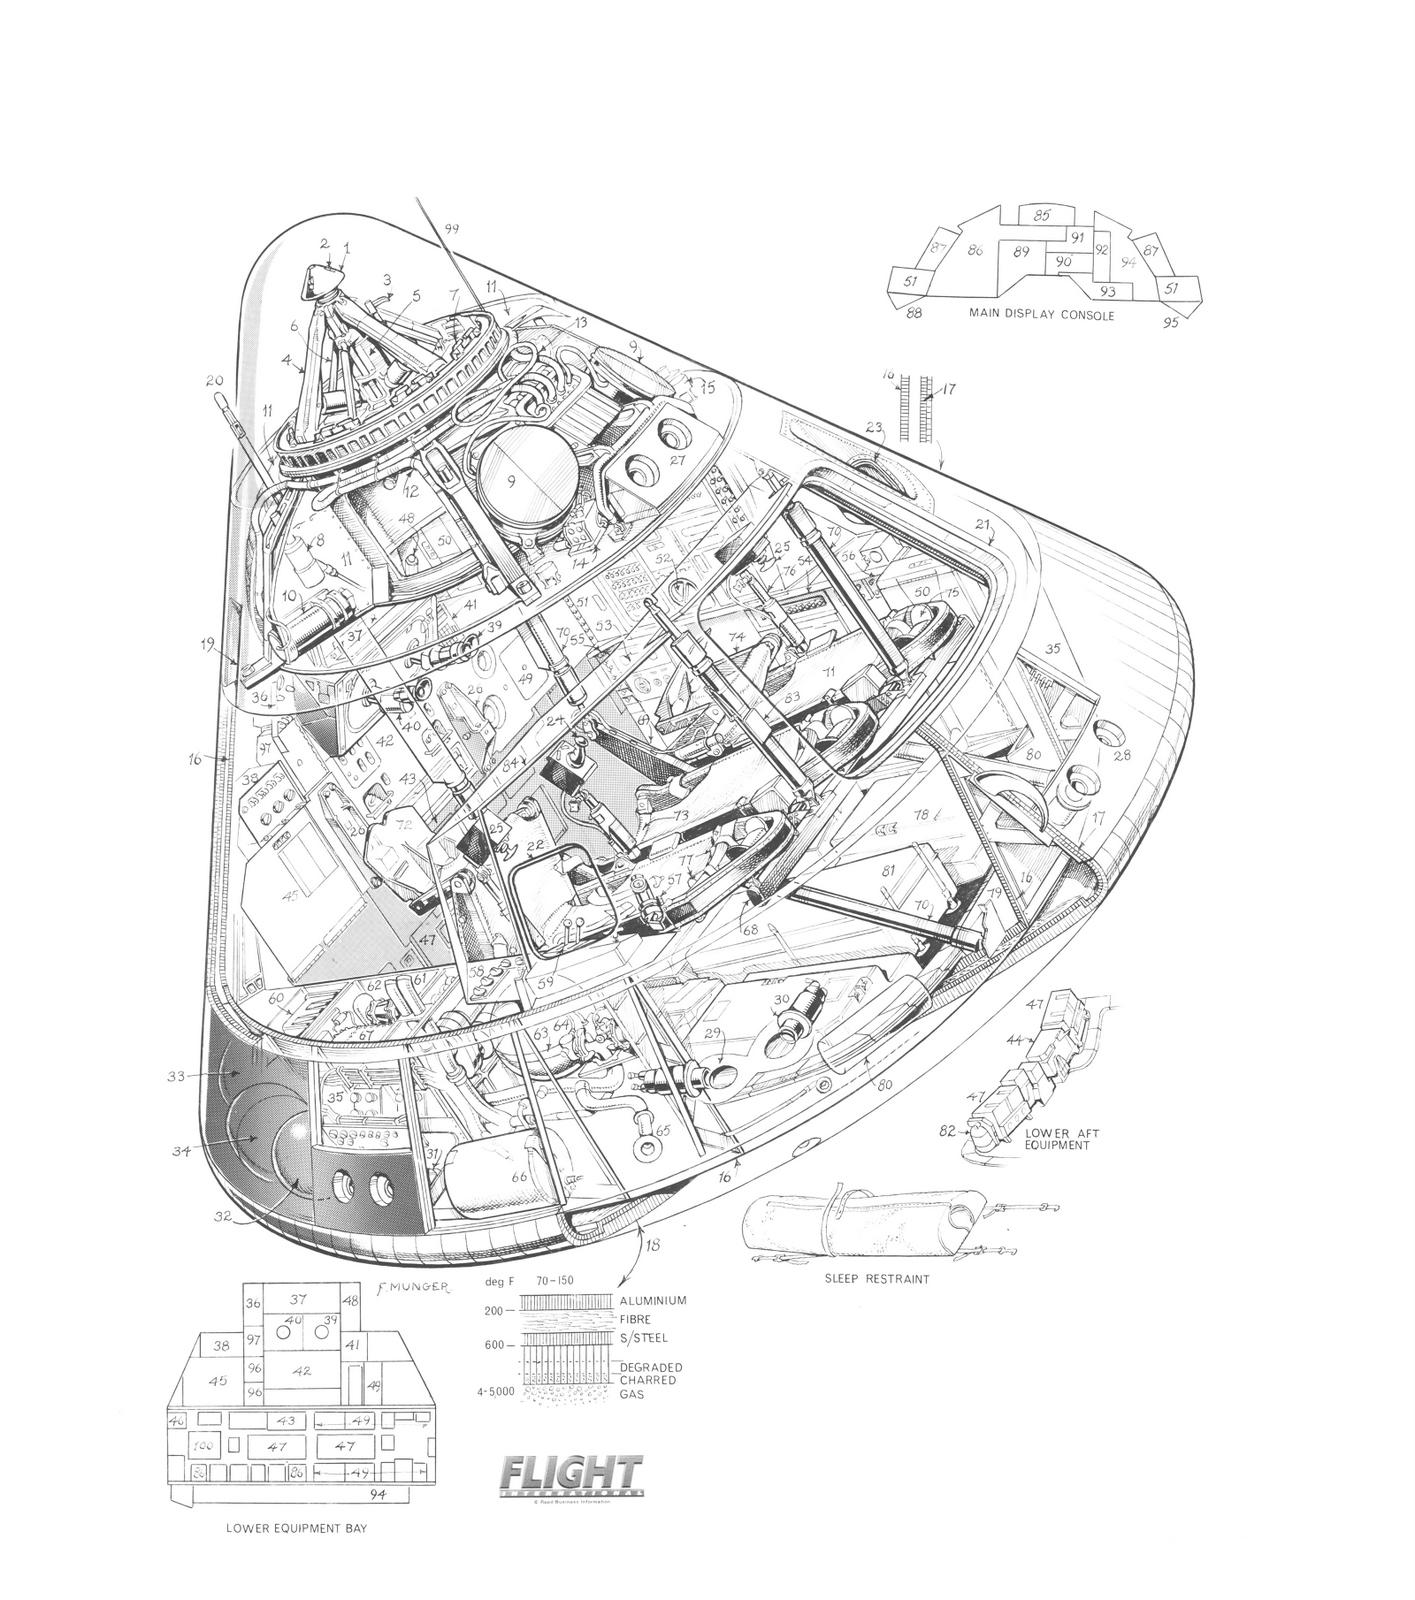 lunar landing module drawings - photo #11